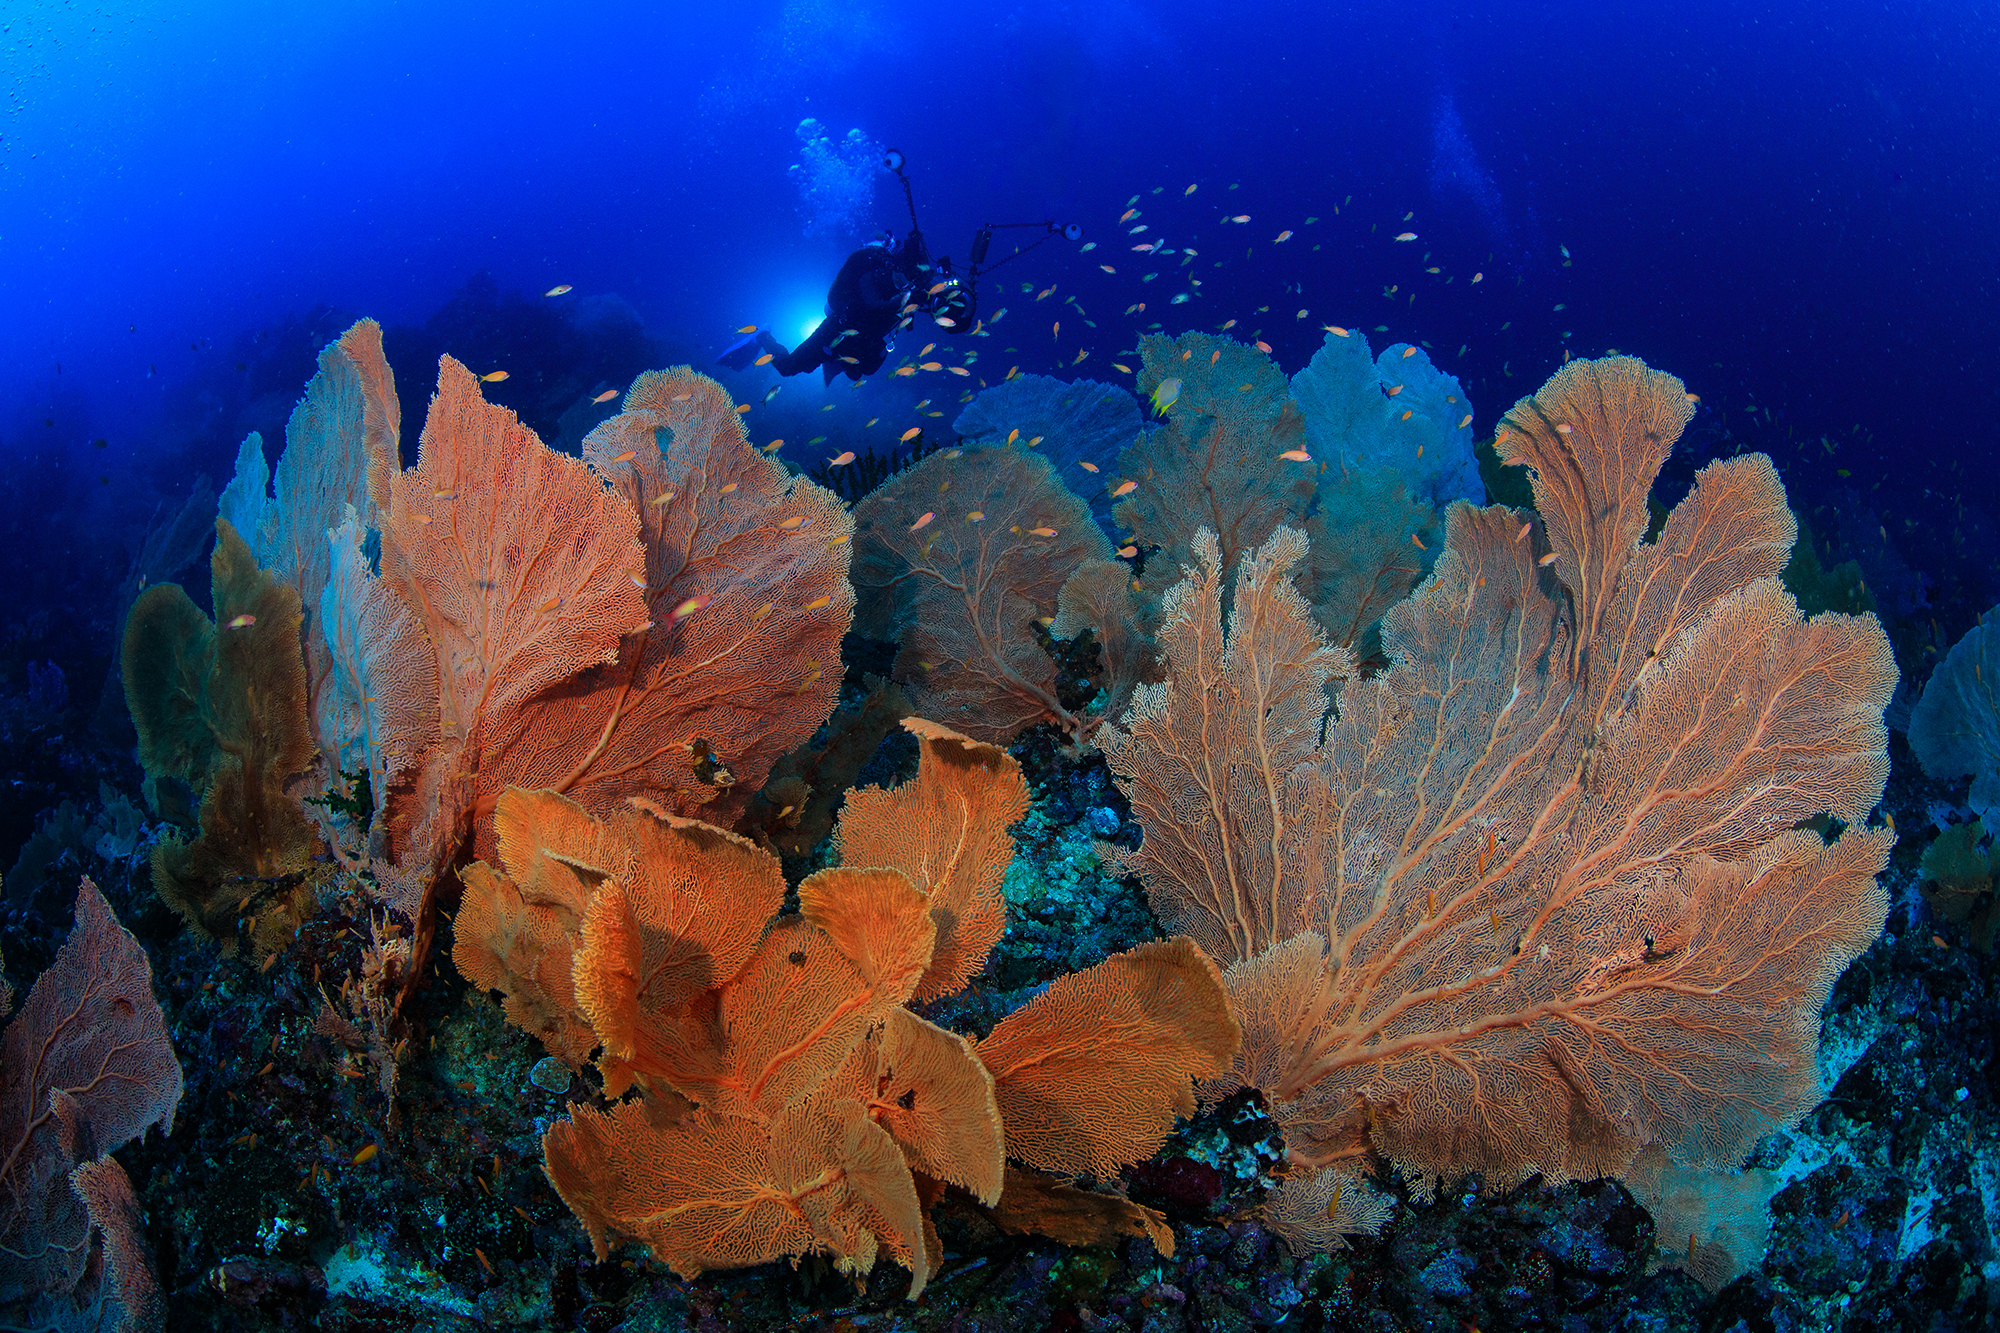 palau weh, indonesia credit: yen-yi lee /coral reef image bank